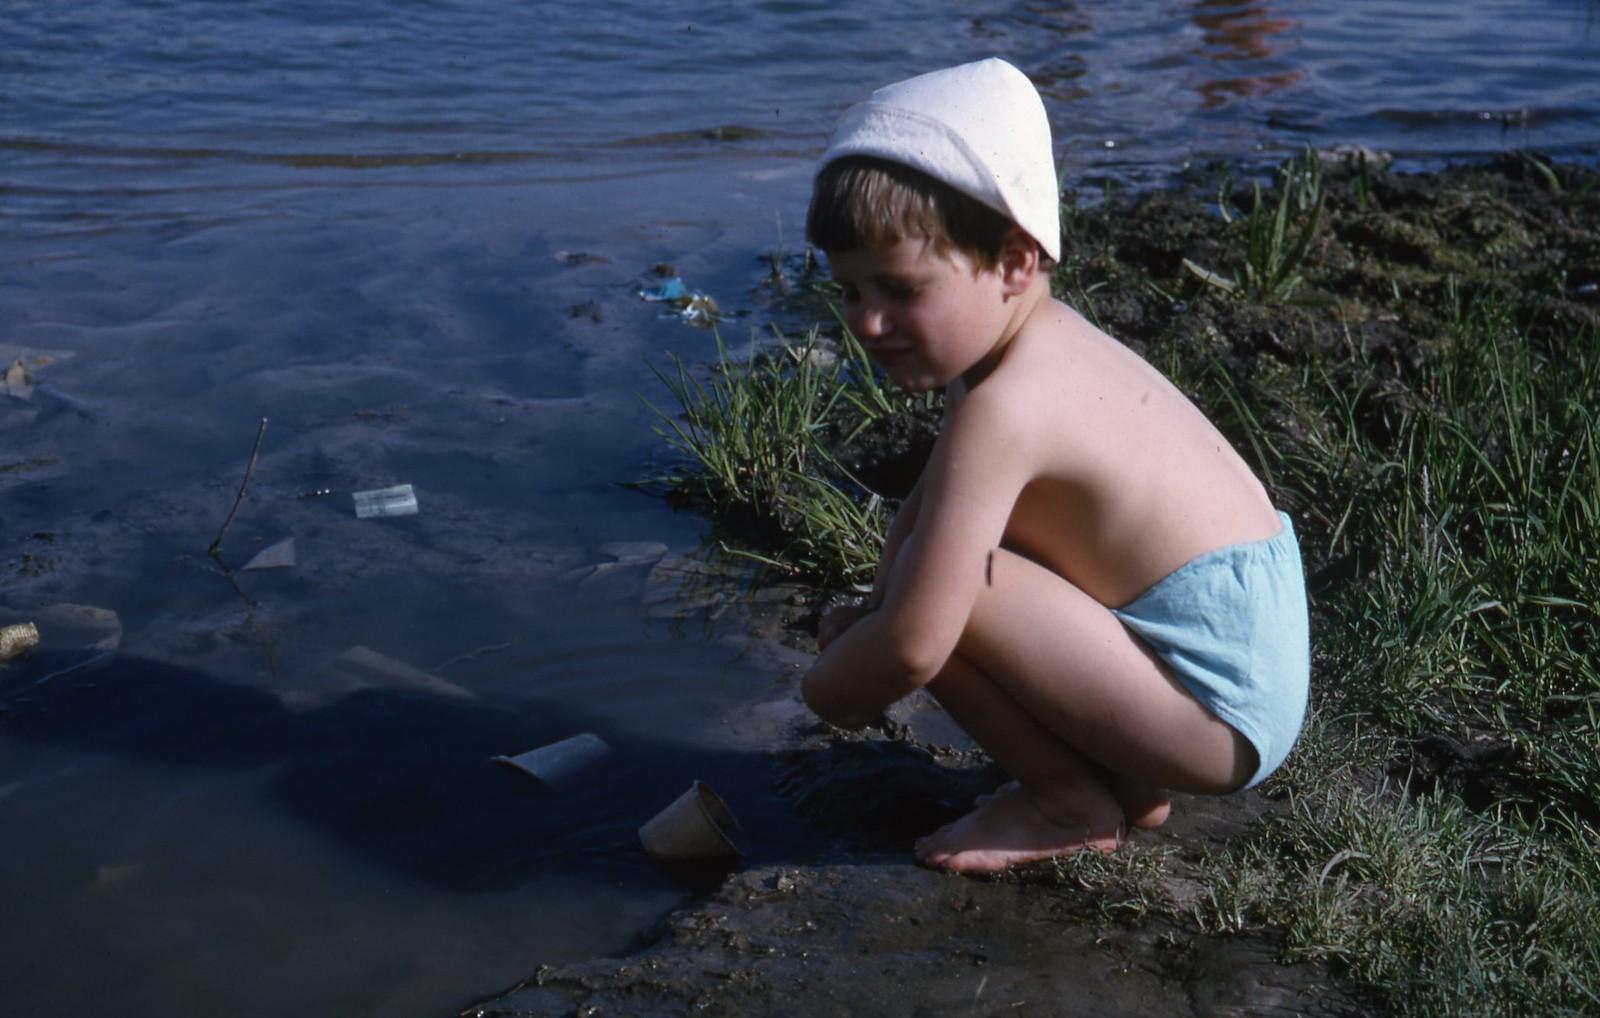 hammond-MA10-Ostankino-people-sunbathing-and-fishing-012